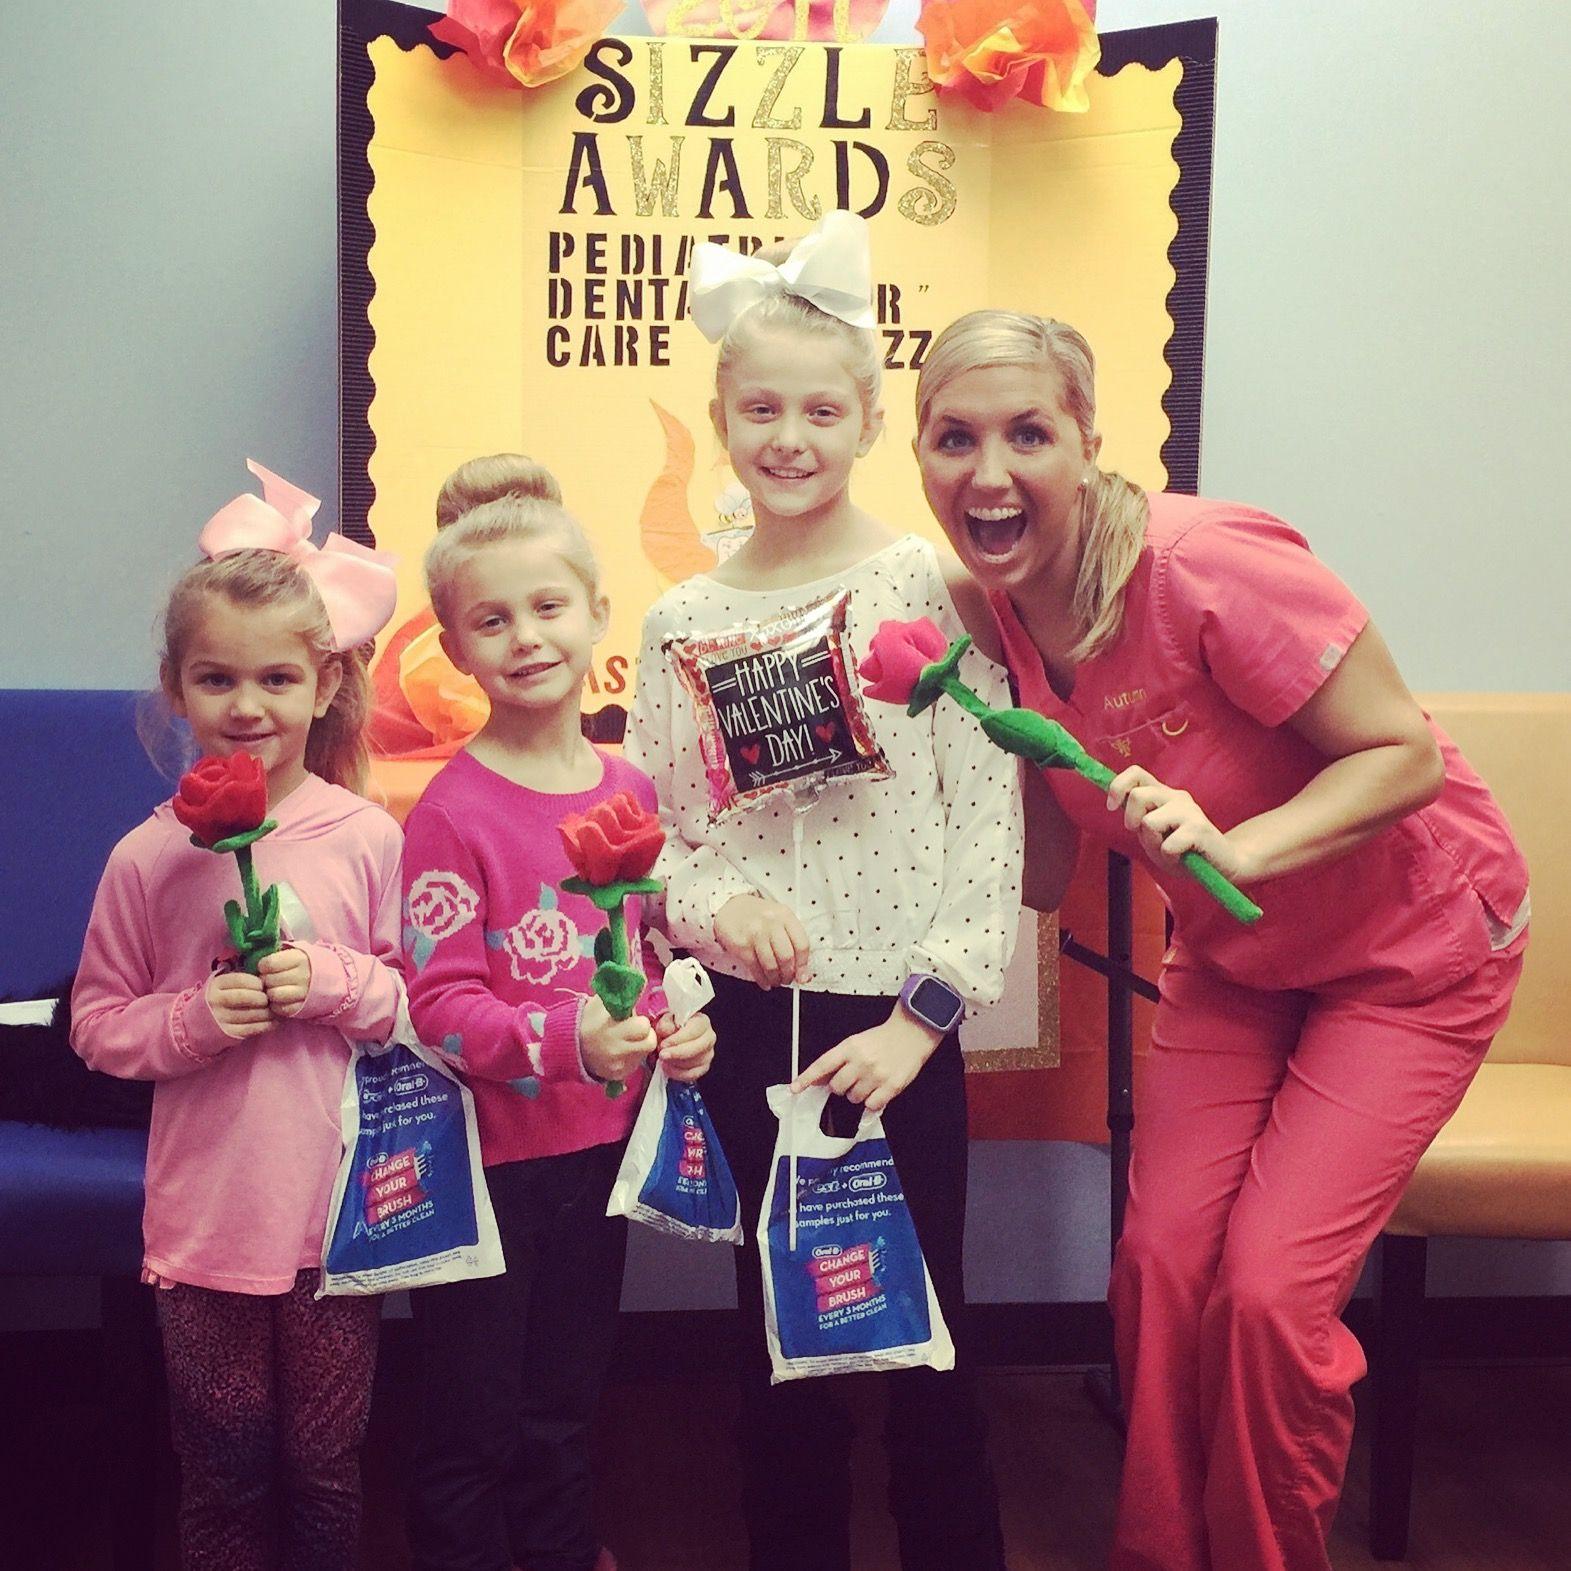 Franklin, TN Dental care, Pediatrics, Dental